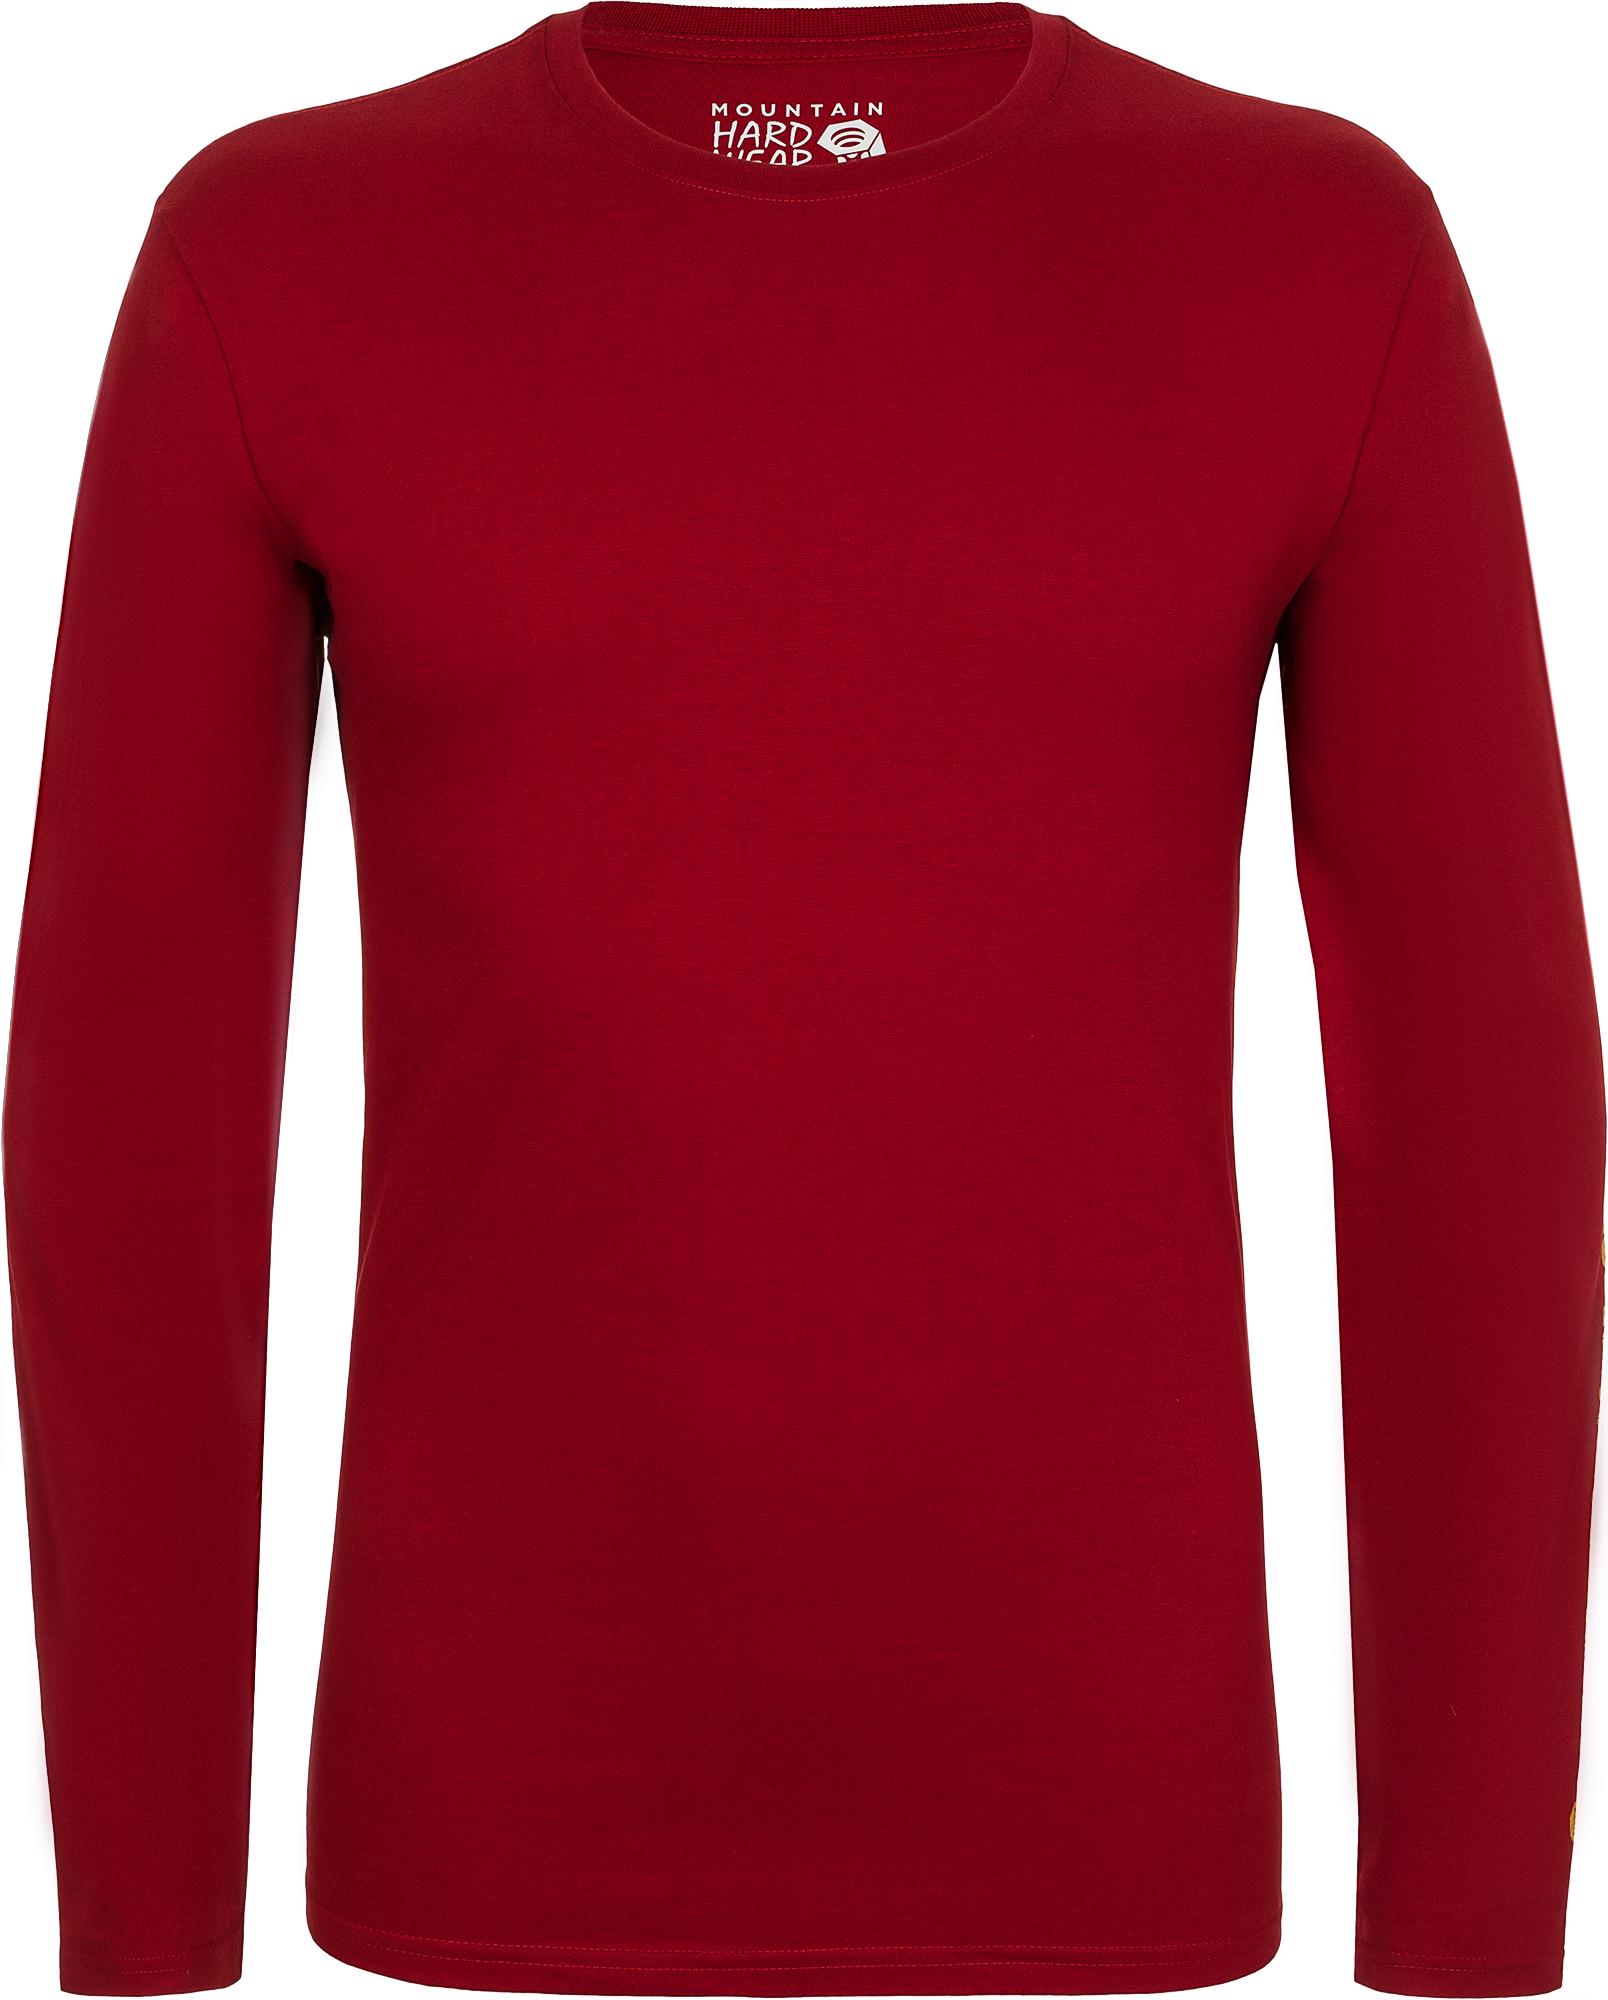 цена на Mountain Hardwear Лонгслив мужской Mountain Hardwear Vertical Oriented™, размер 56